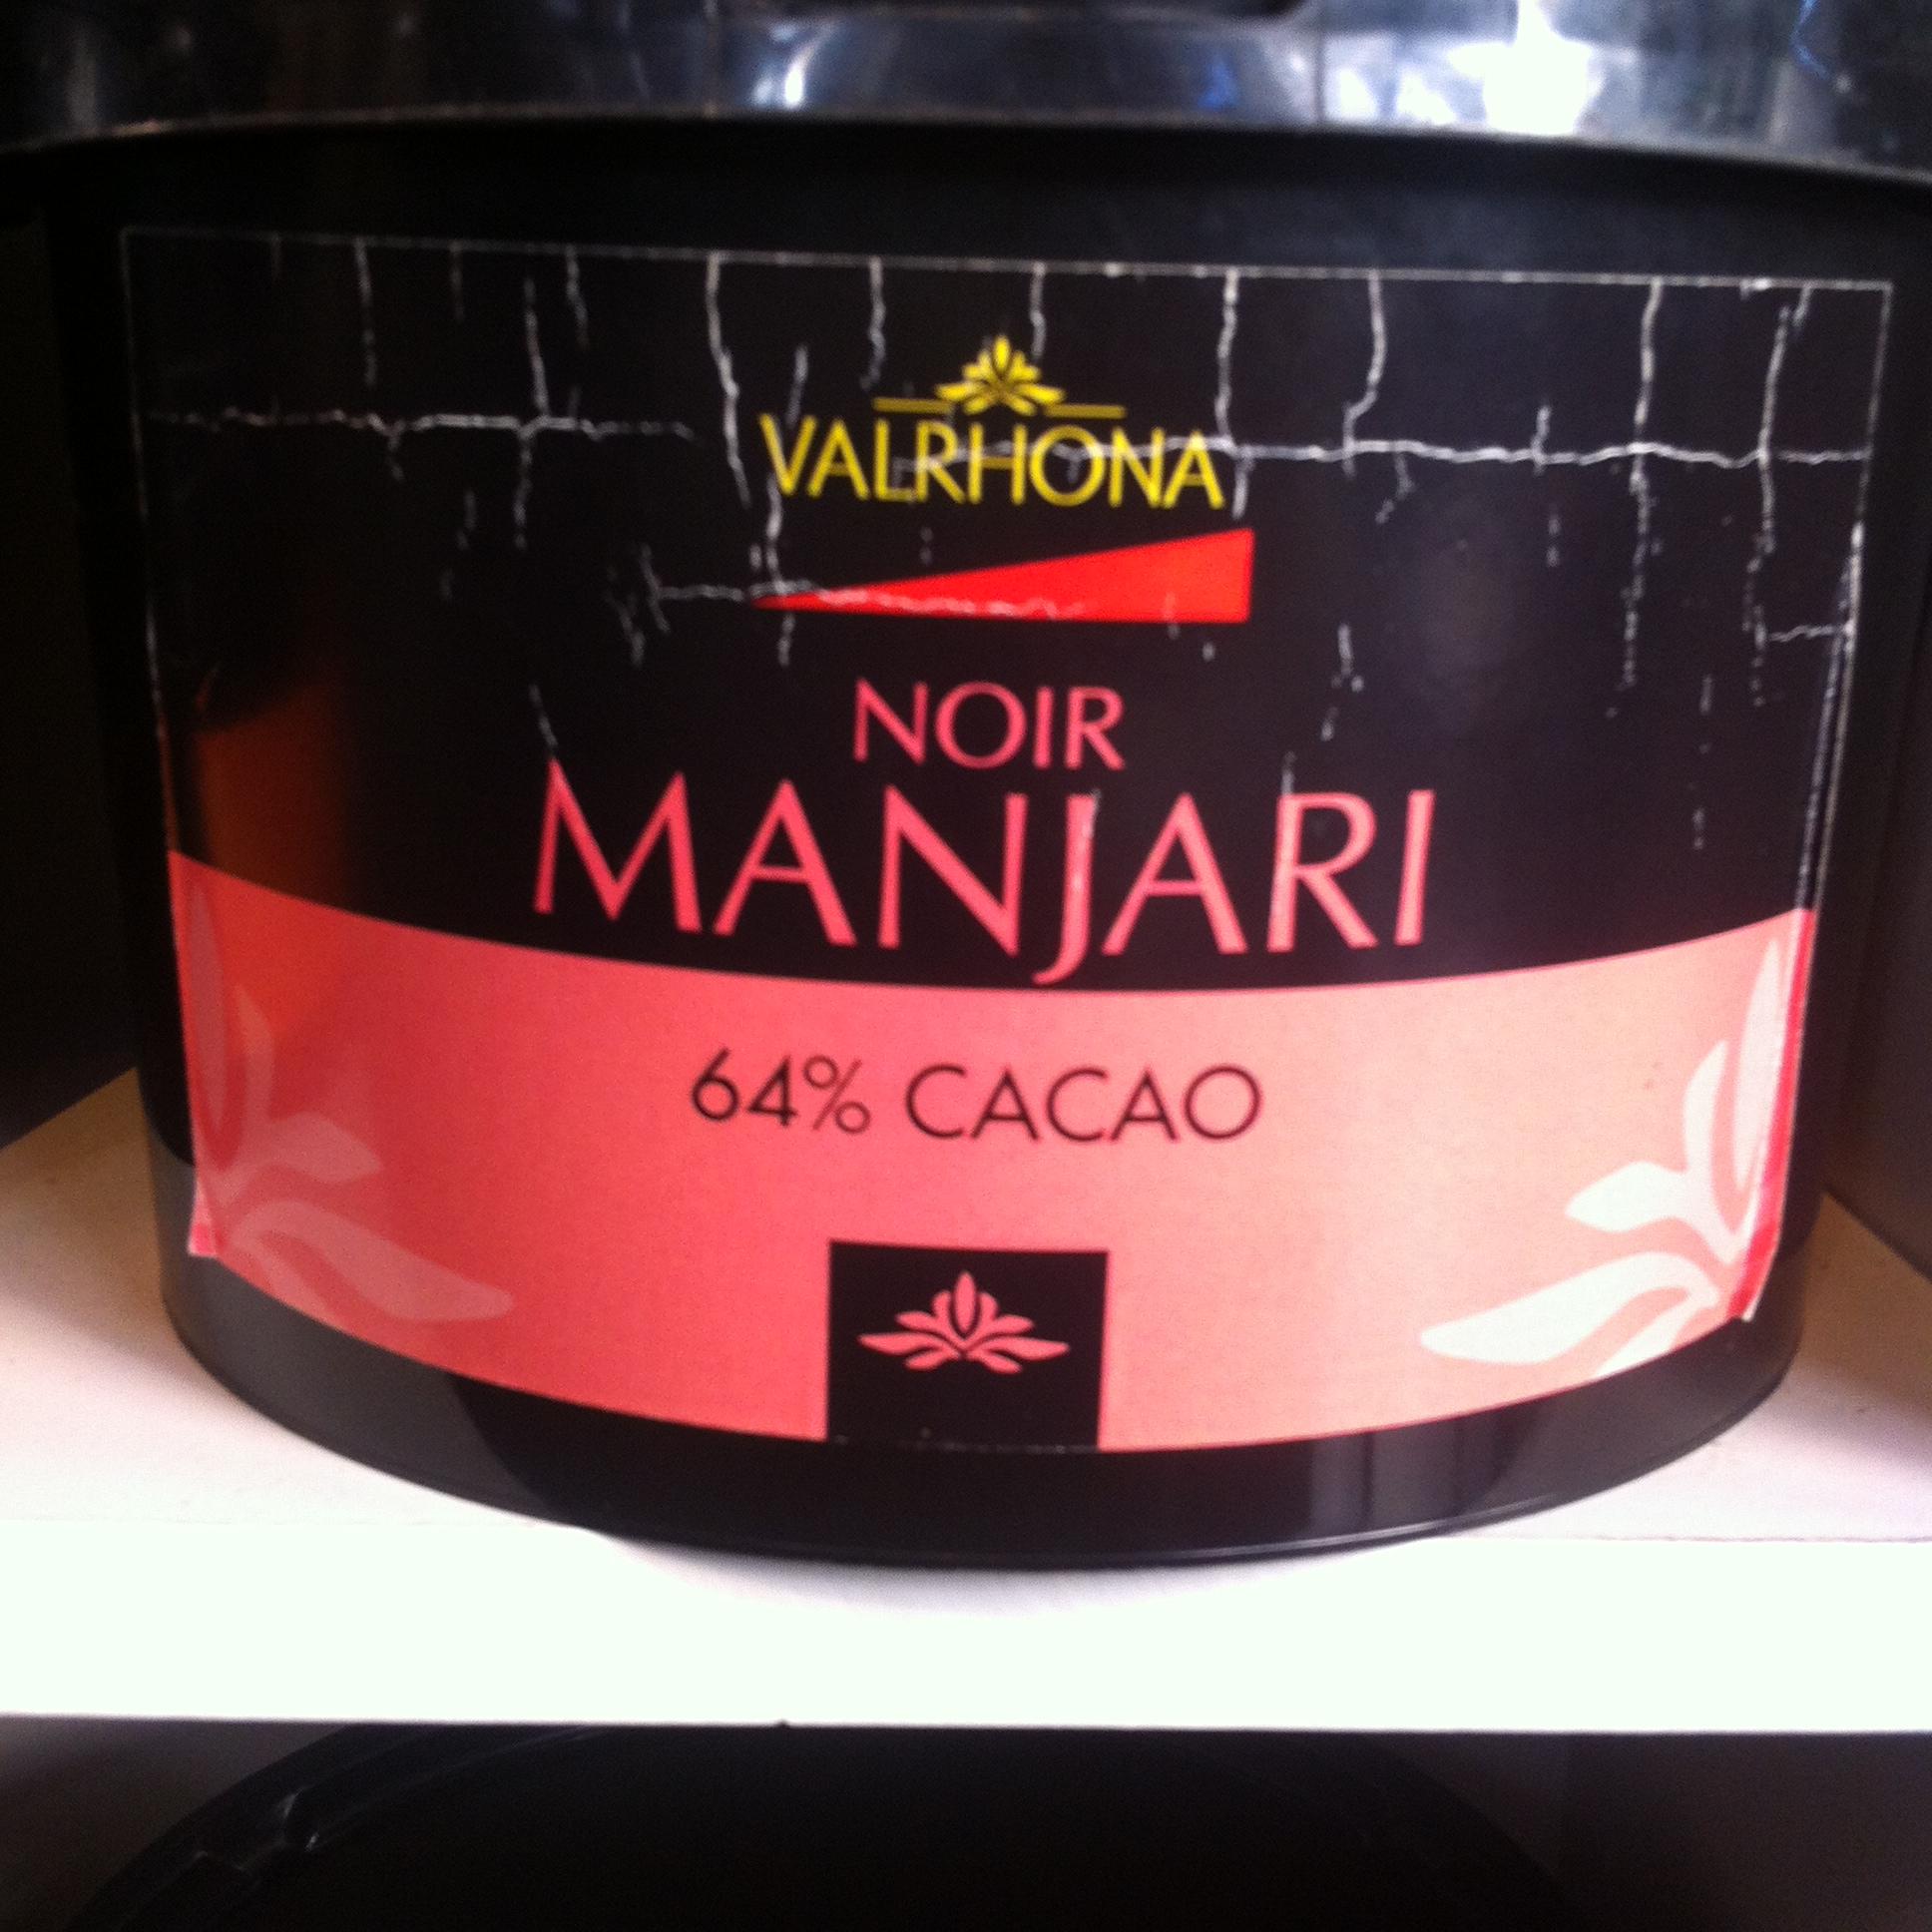 Manjari chocolate. interesting ending